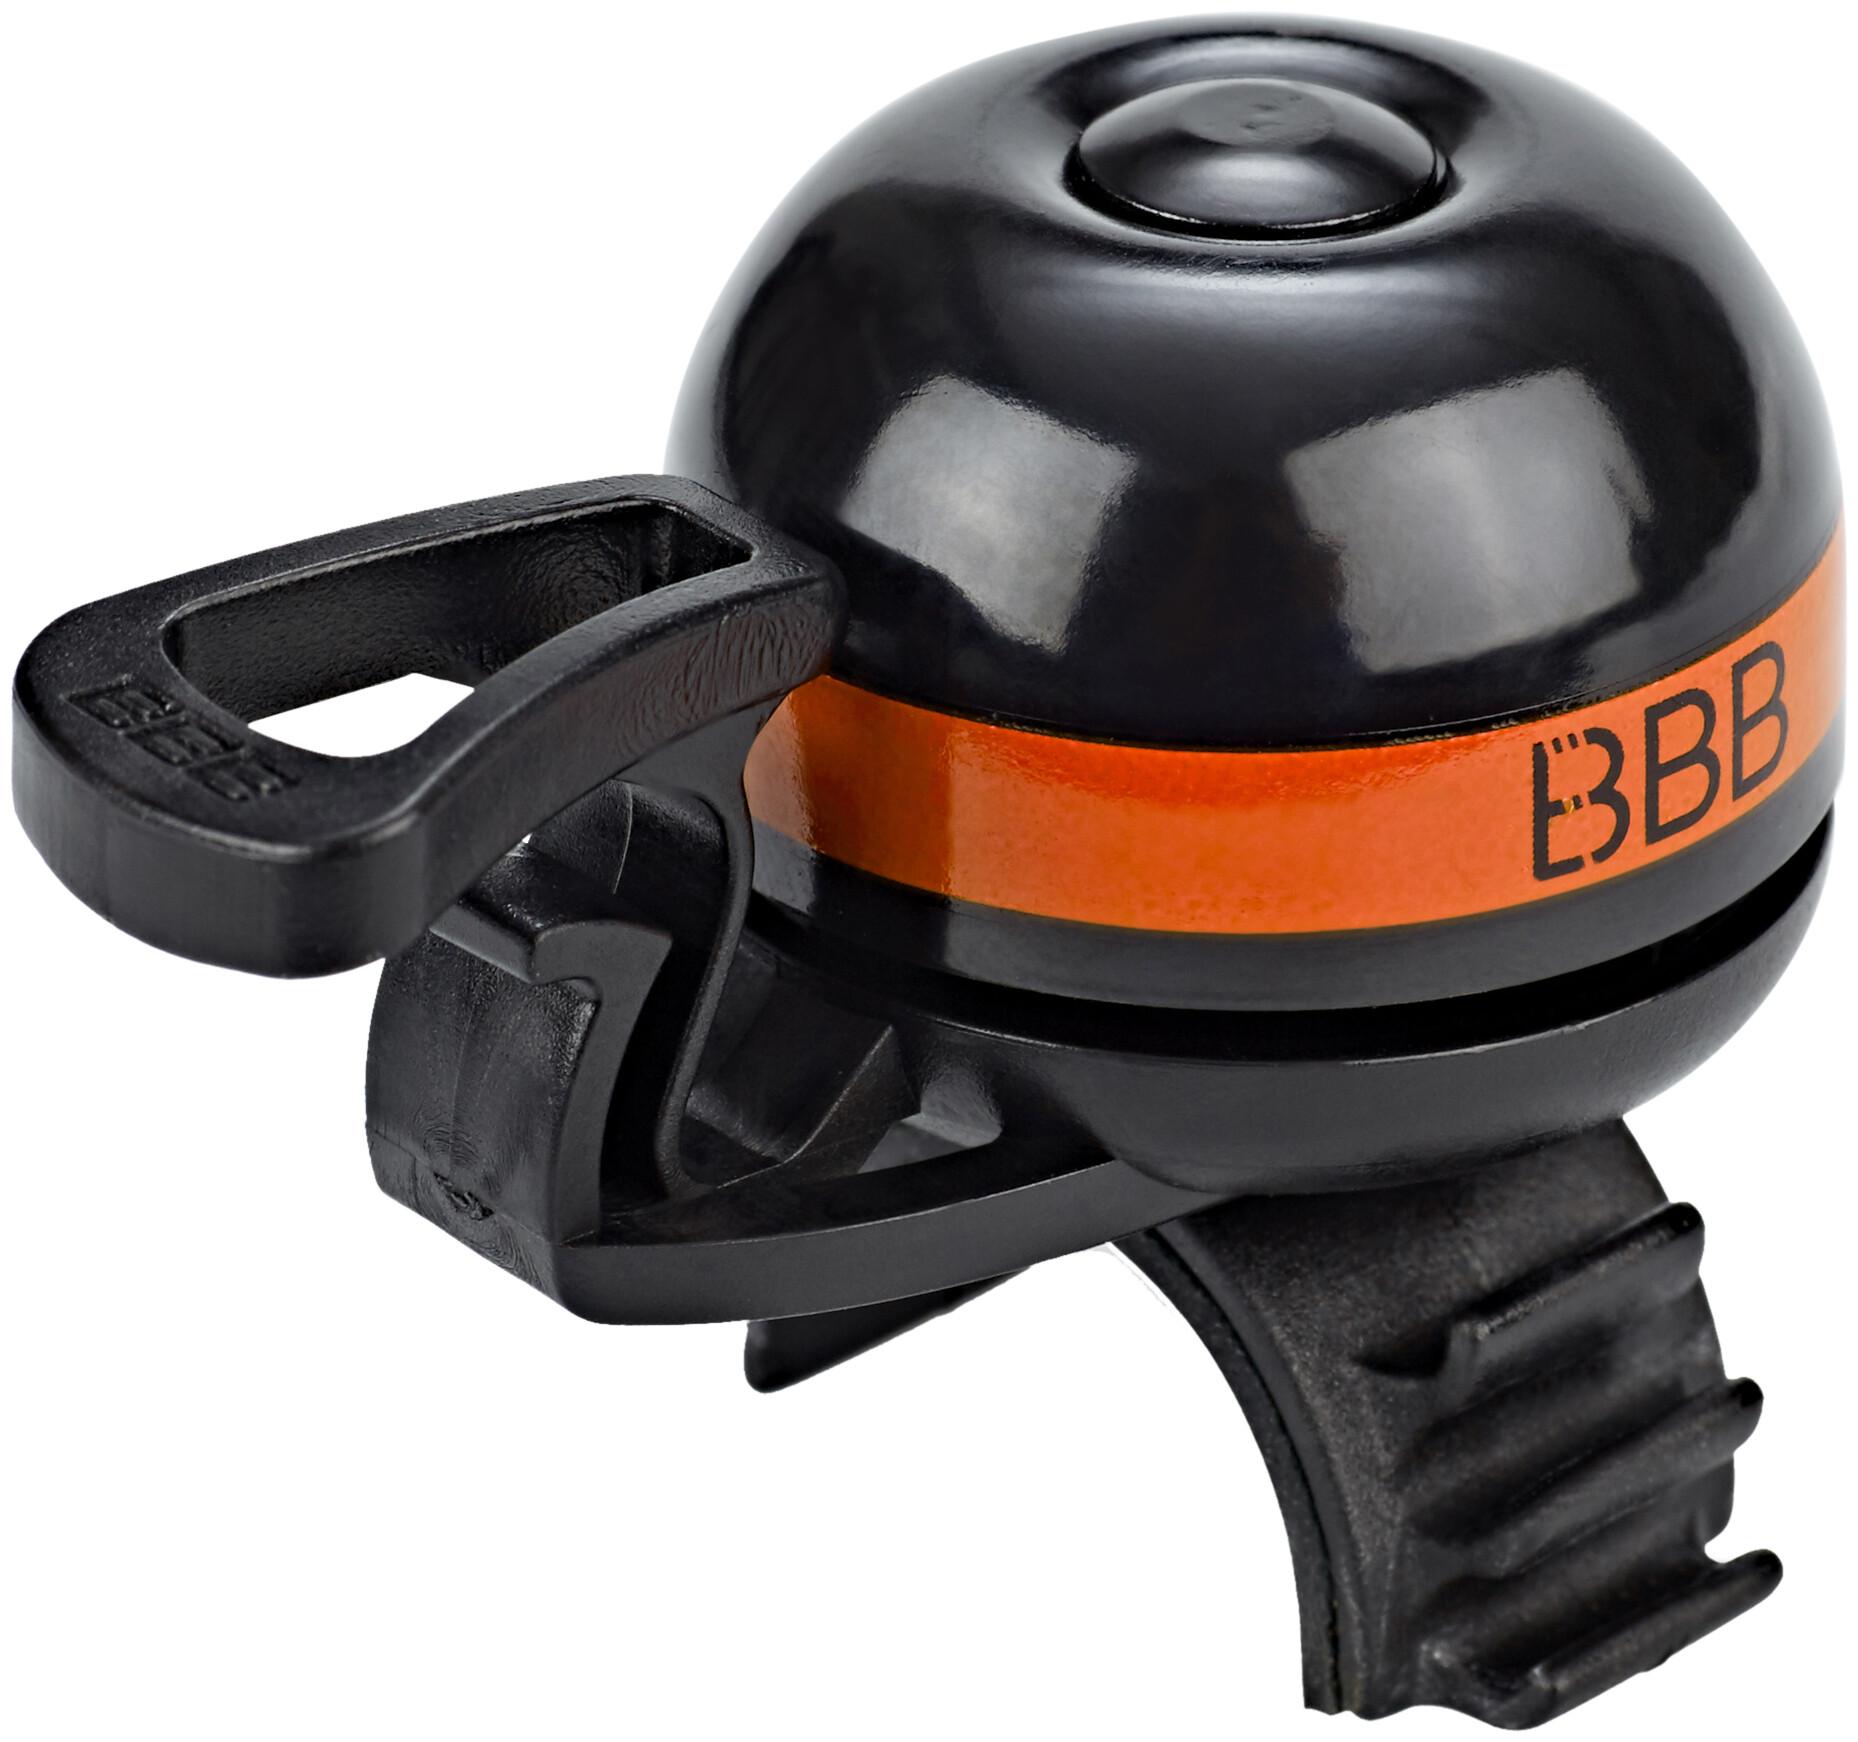 BBB EasyFit Deluxe BBB-14 Ringeklokke, orange (2019) | Bells